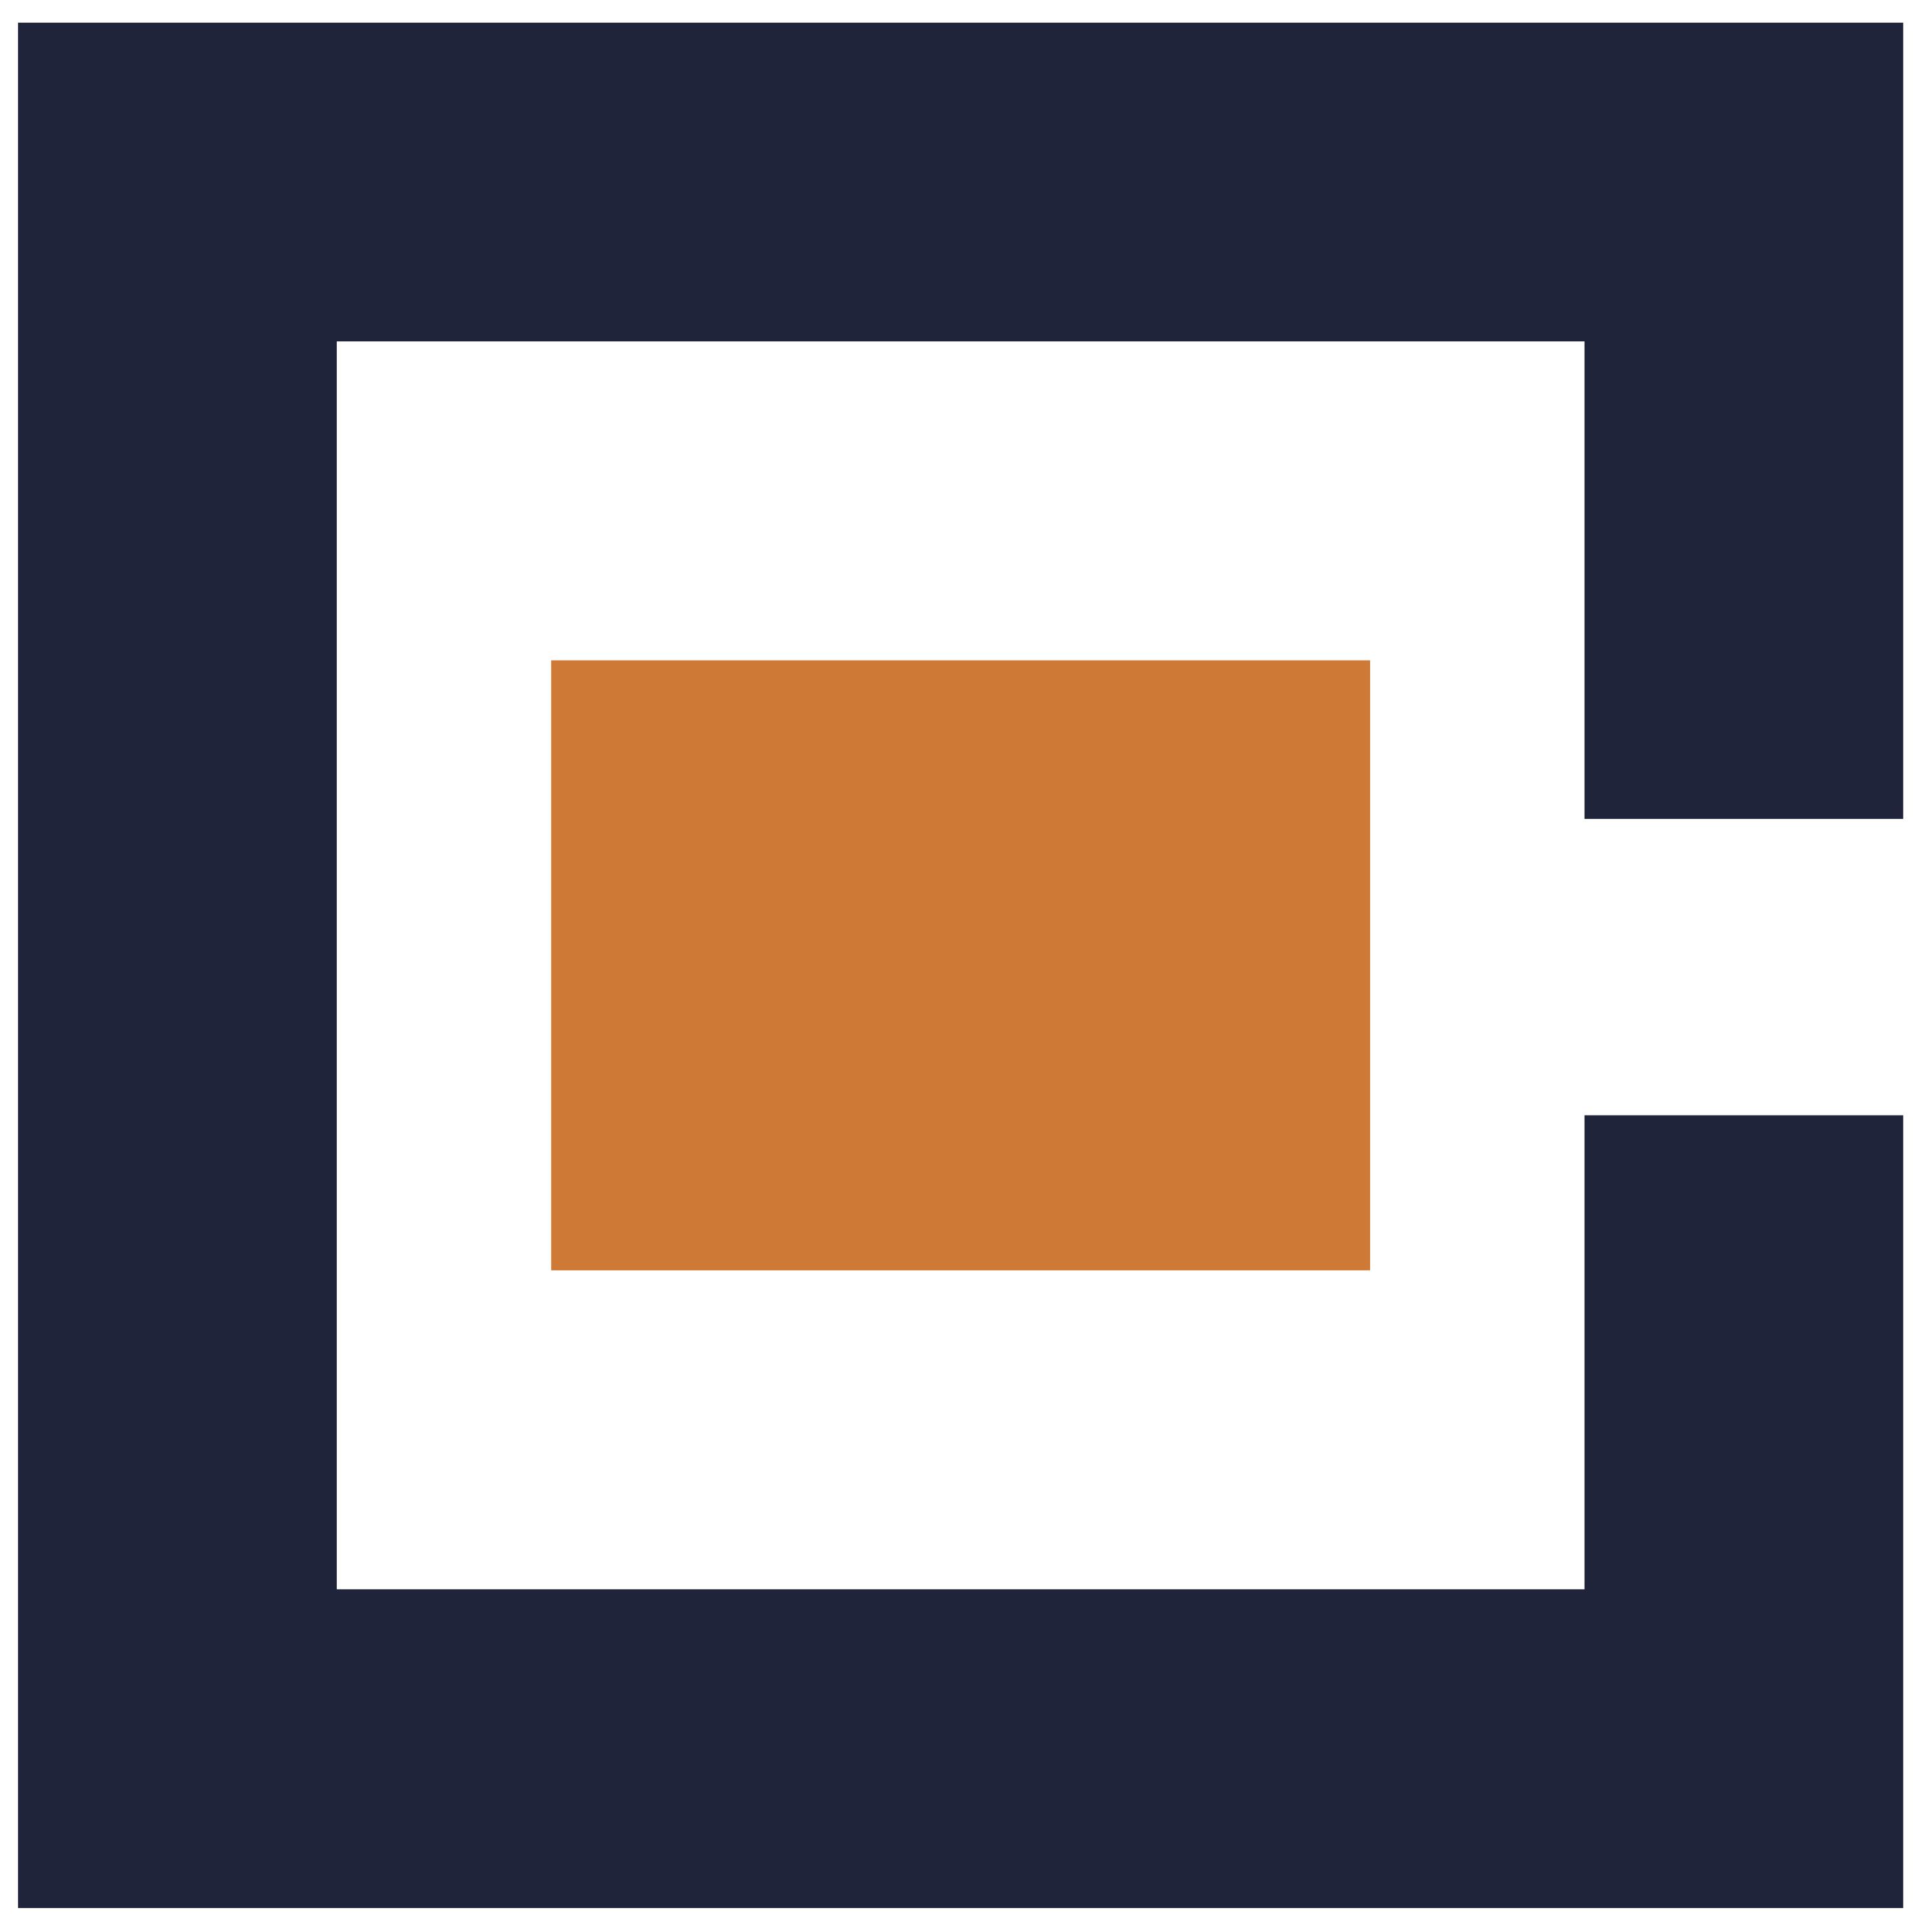 CARDDIO PTE LTD company logo